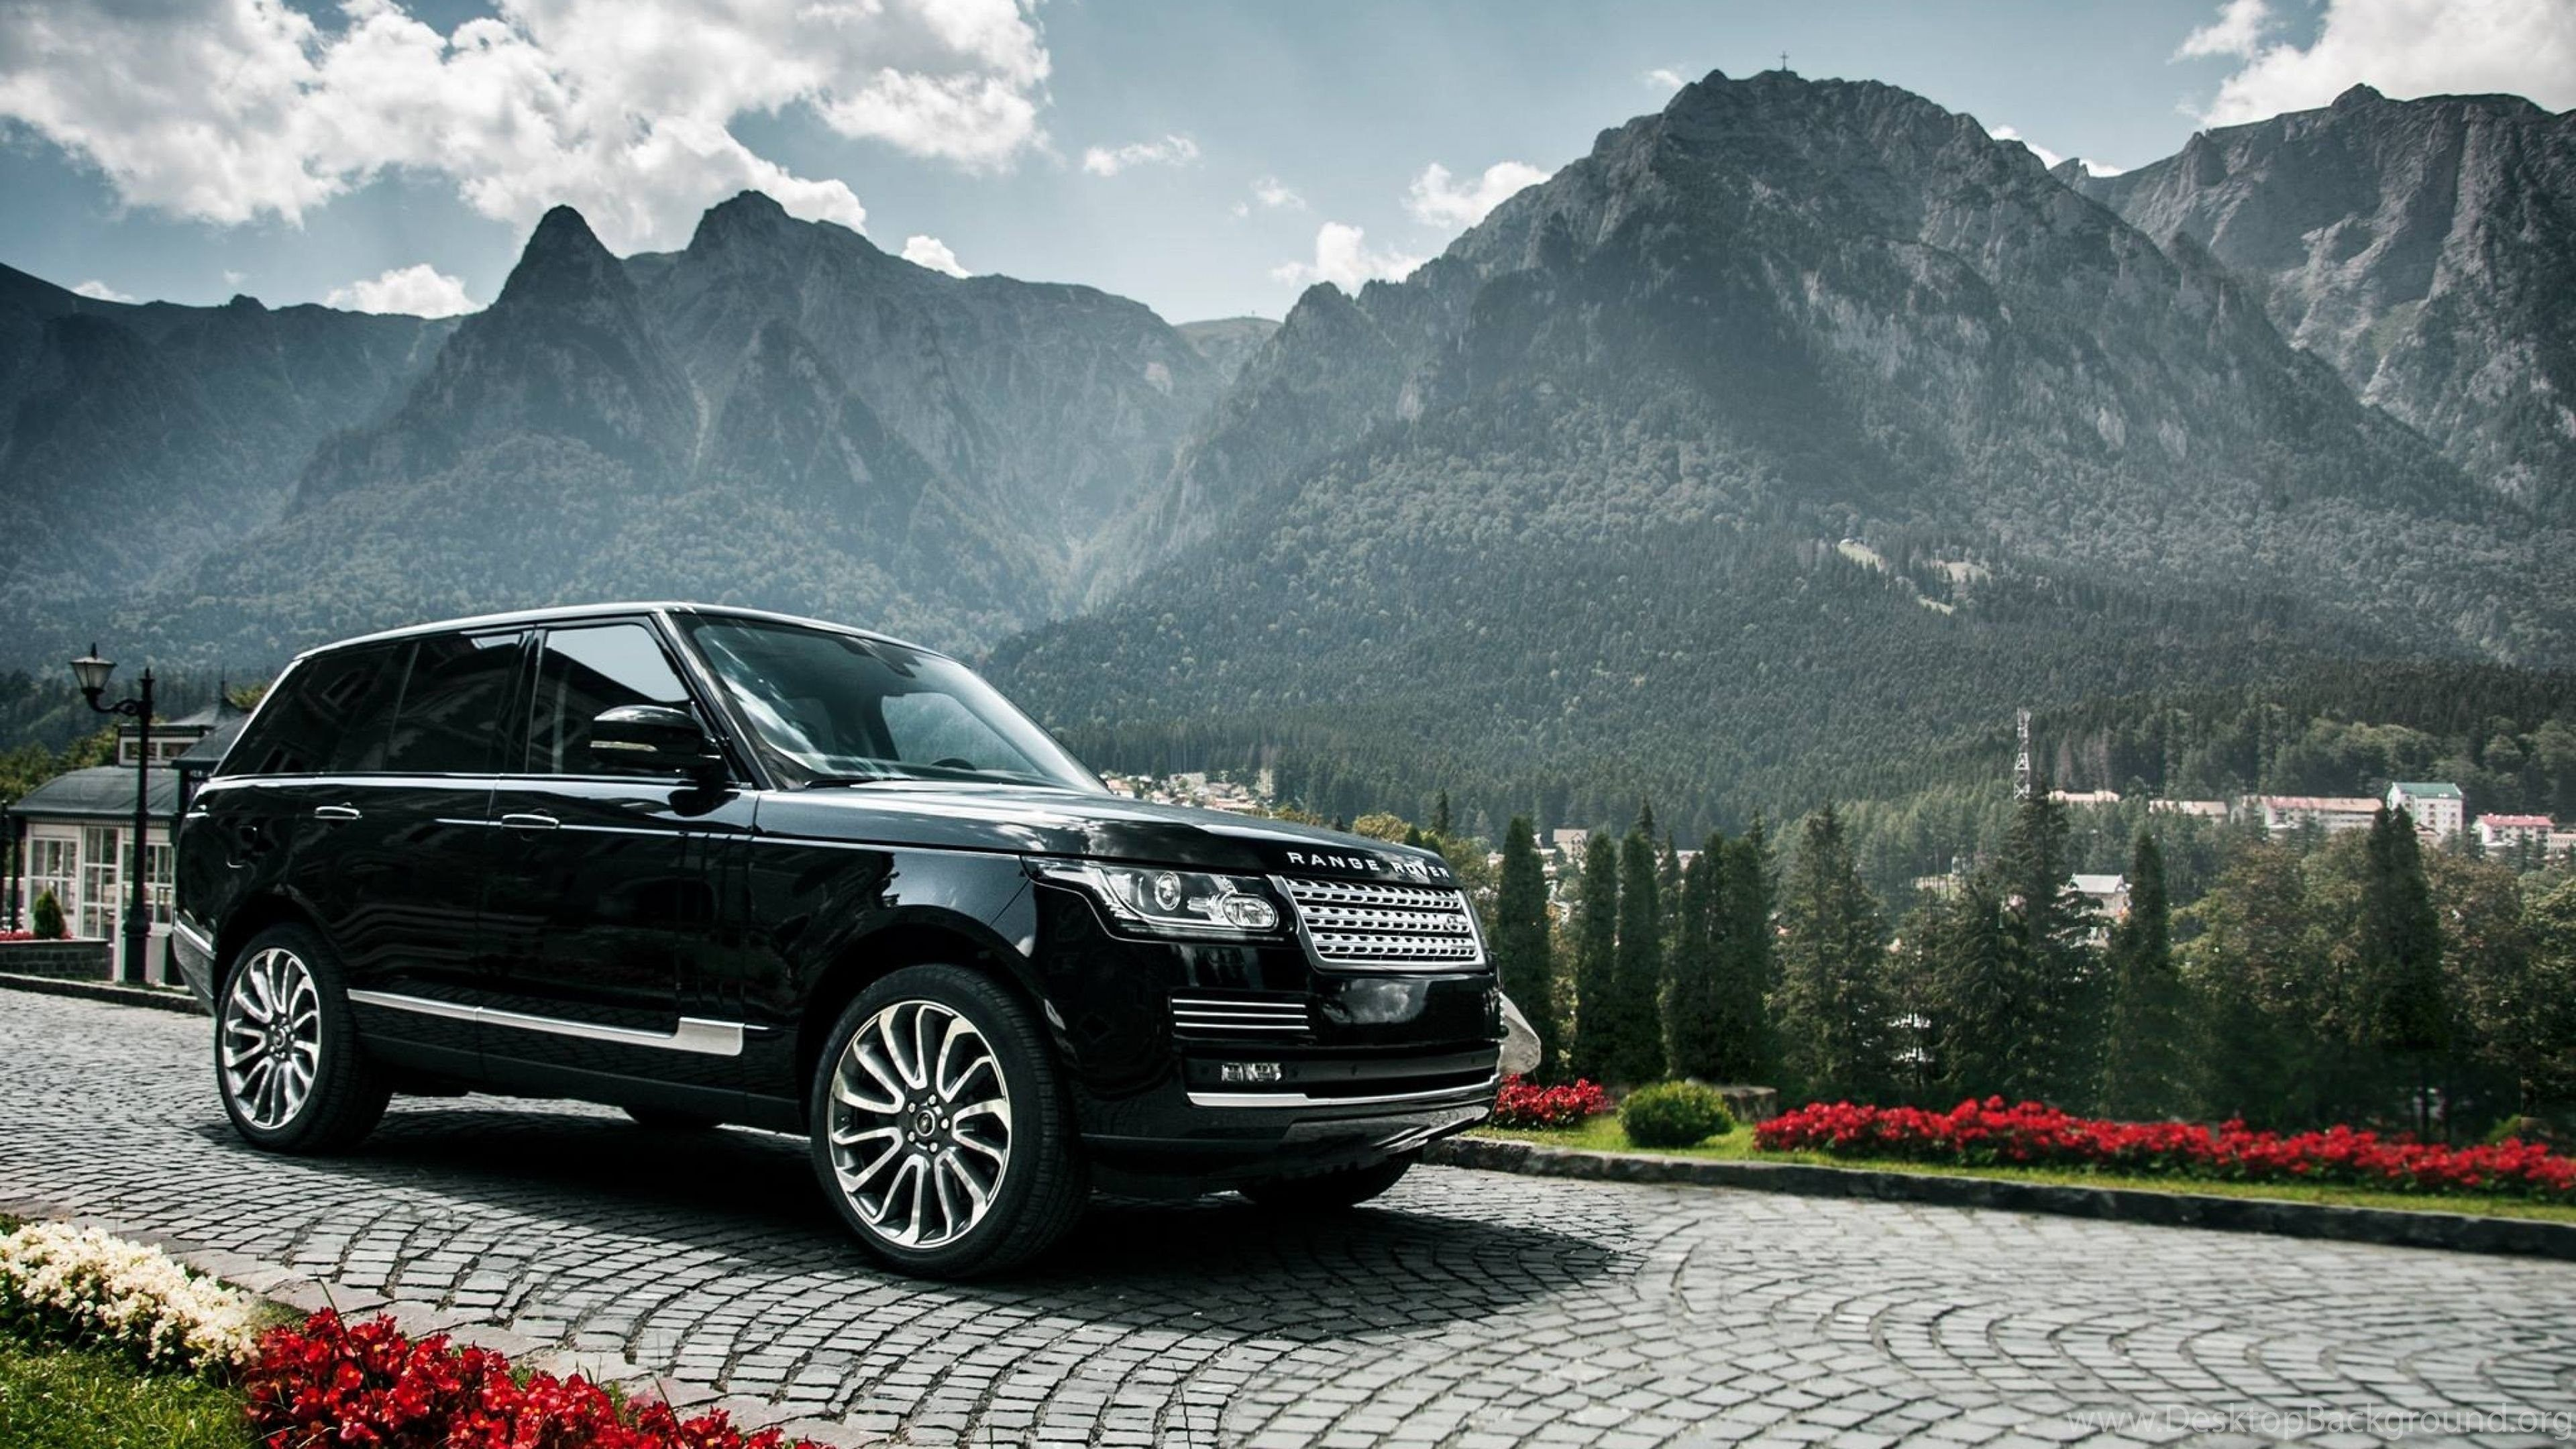 4k Range Rover Wallpapers Top Free 4k Range Rover